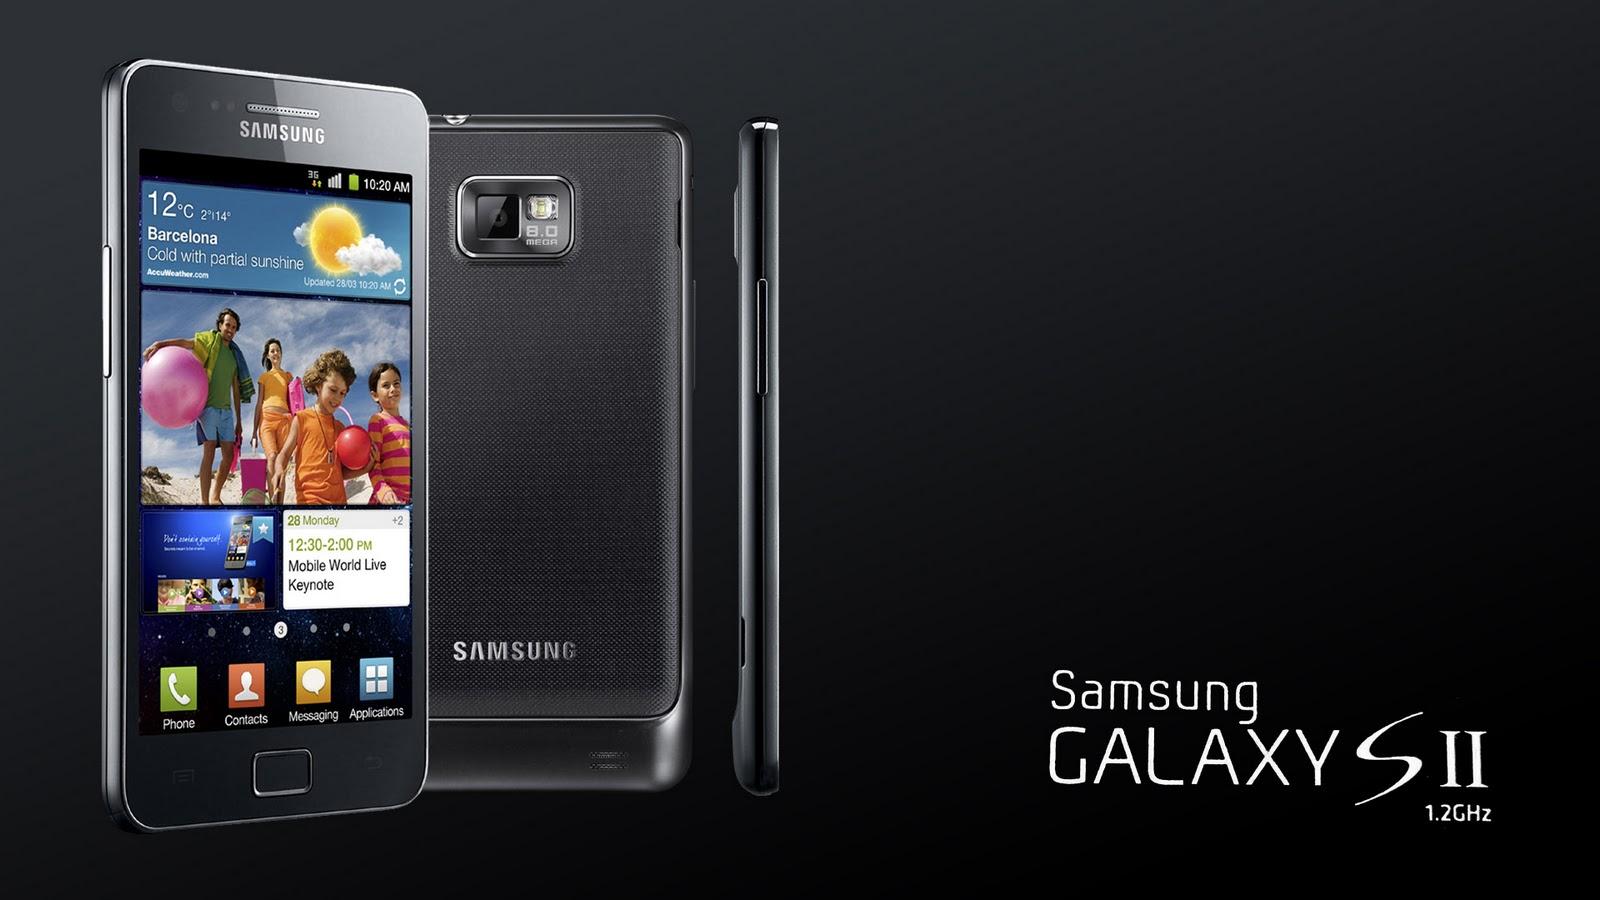 Wallpaper: Galaxy S3 Screen Wallpaper Resolution